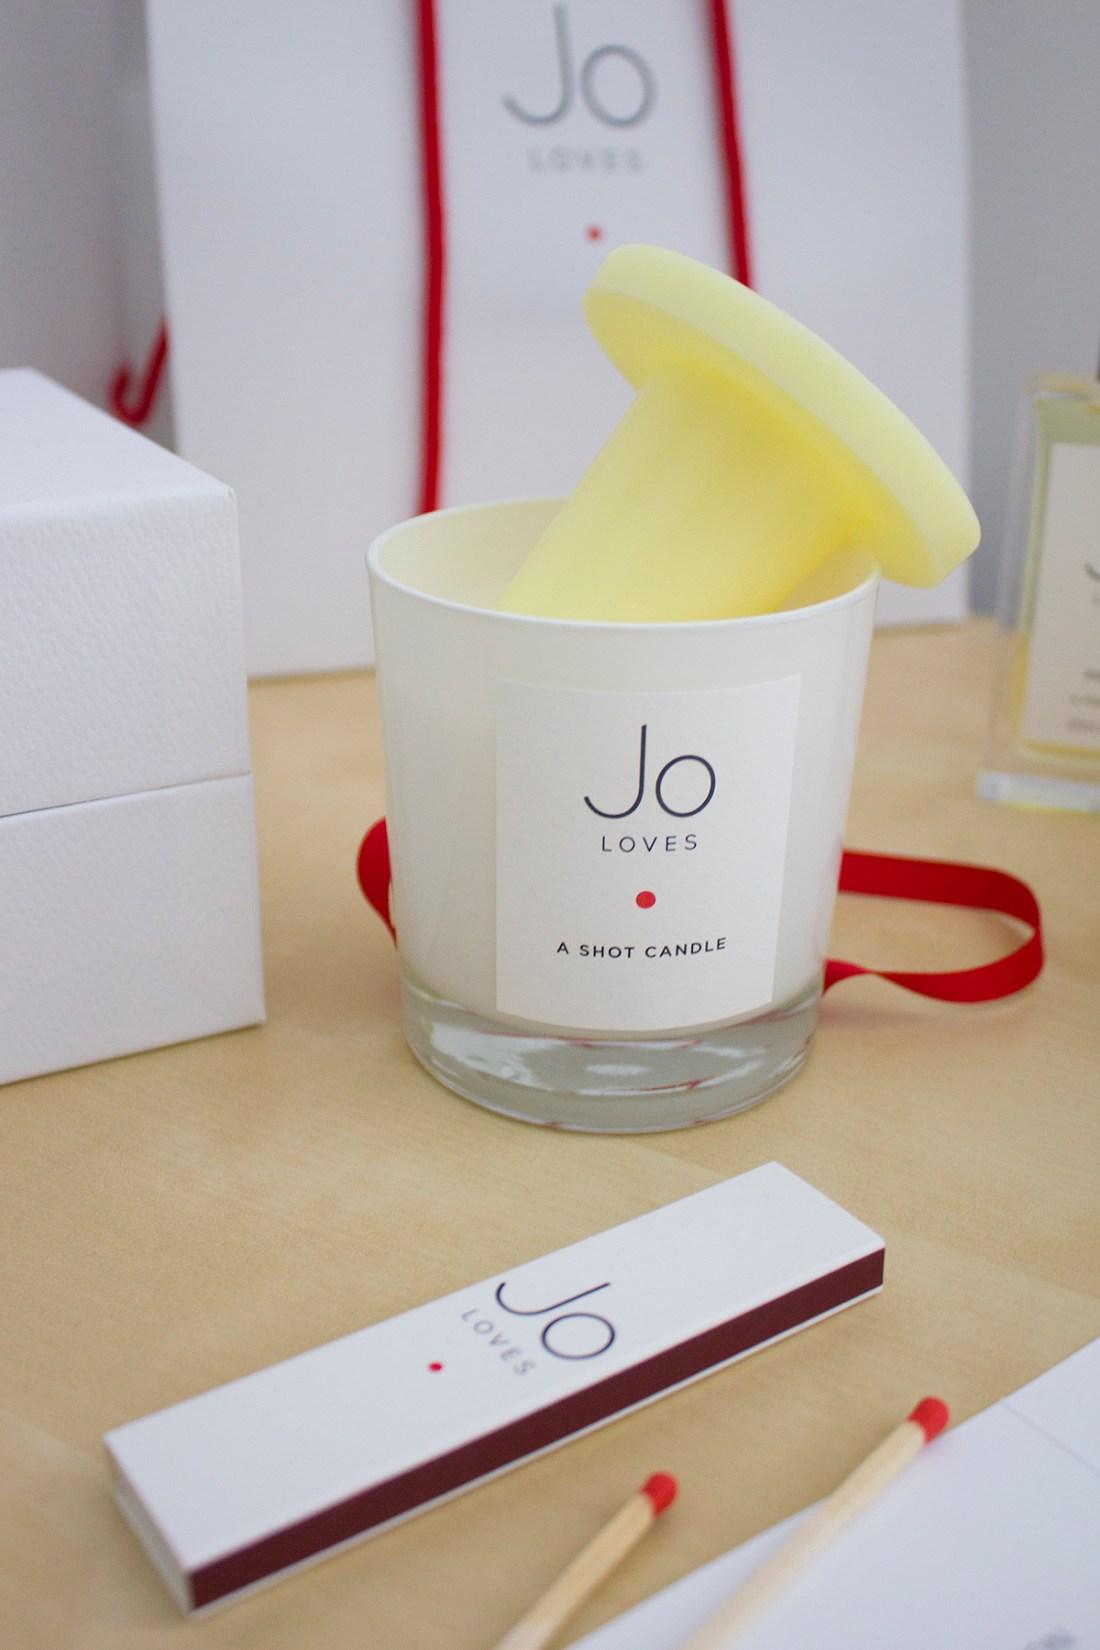 jo-loves-saffron-oud-frangipani-shot-candle